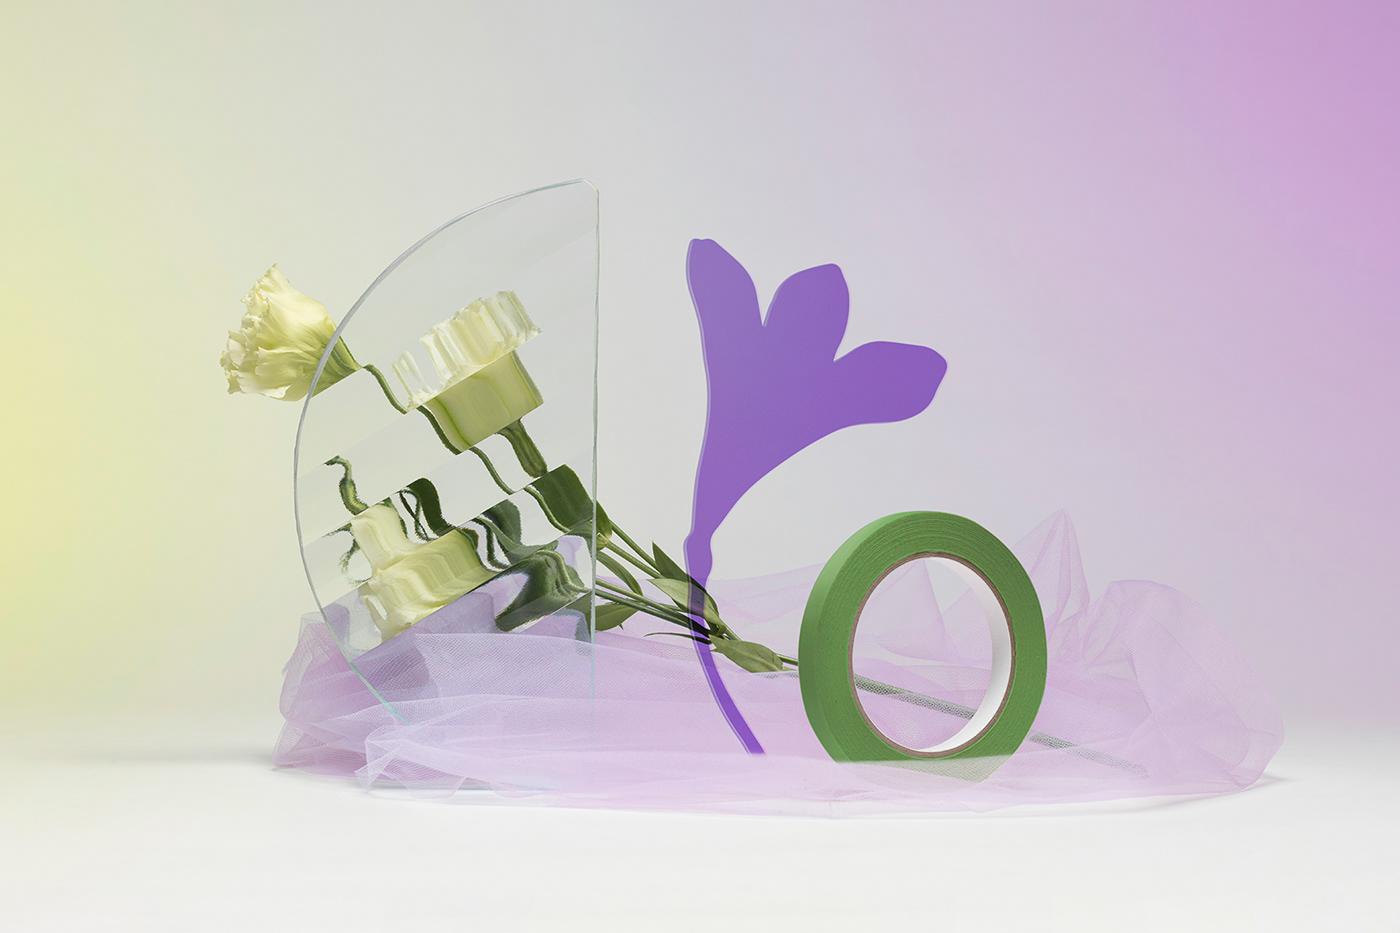 app brand identity business design digital Flowers Nature Platform ux/ui Web